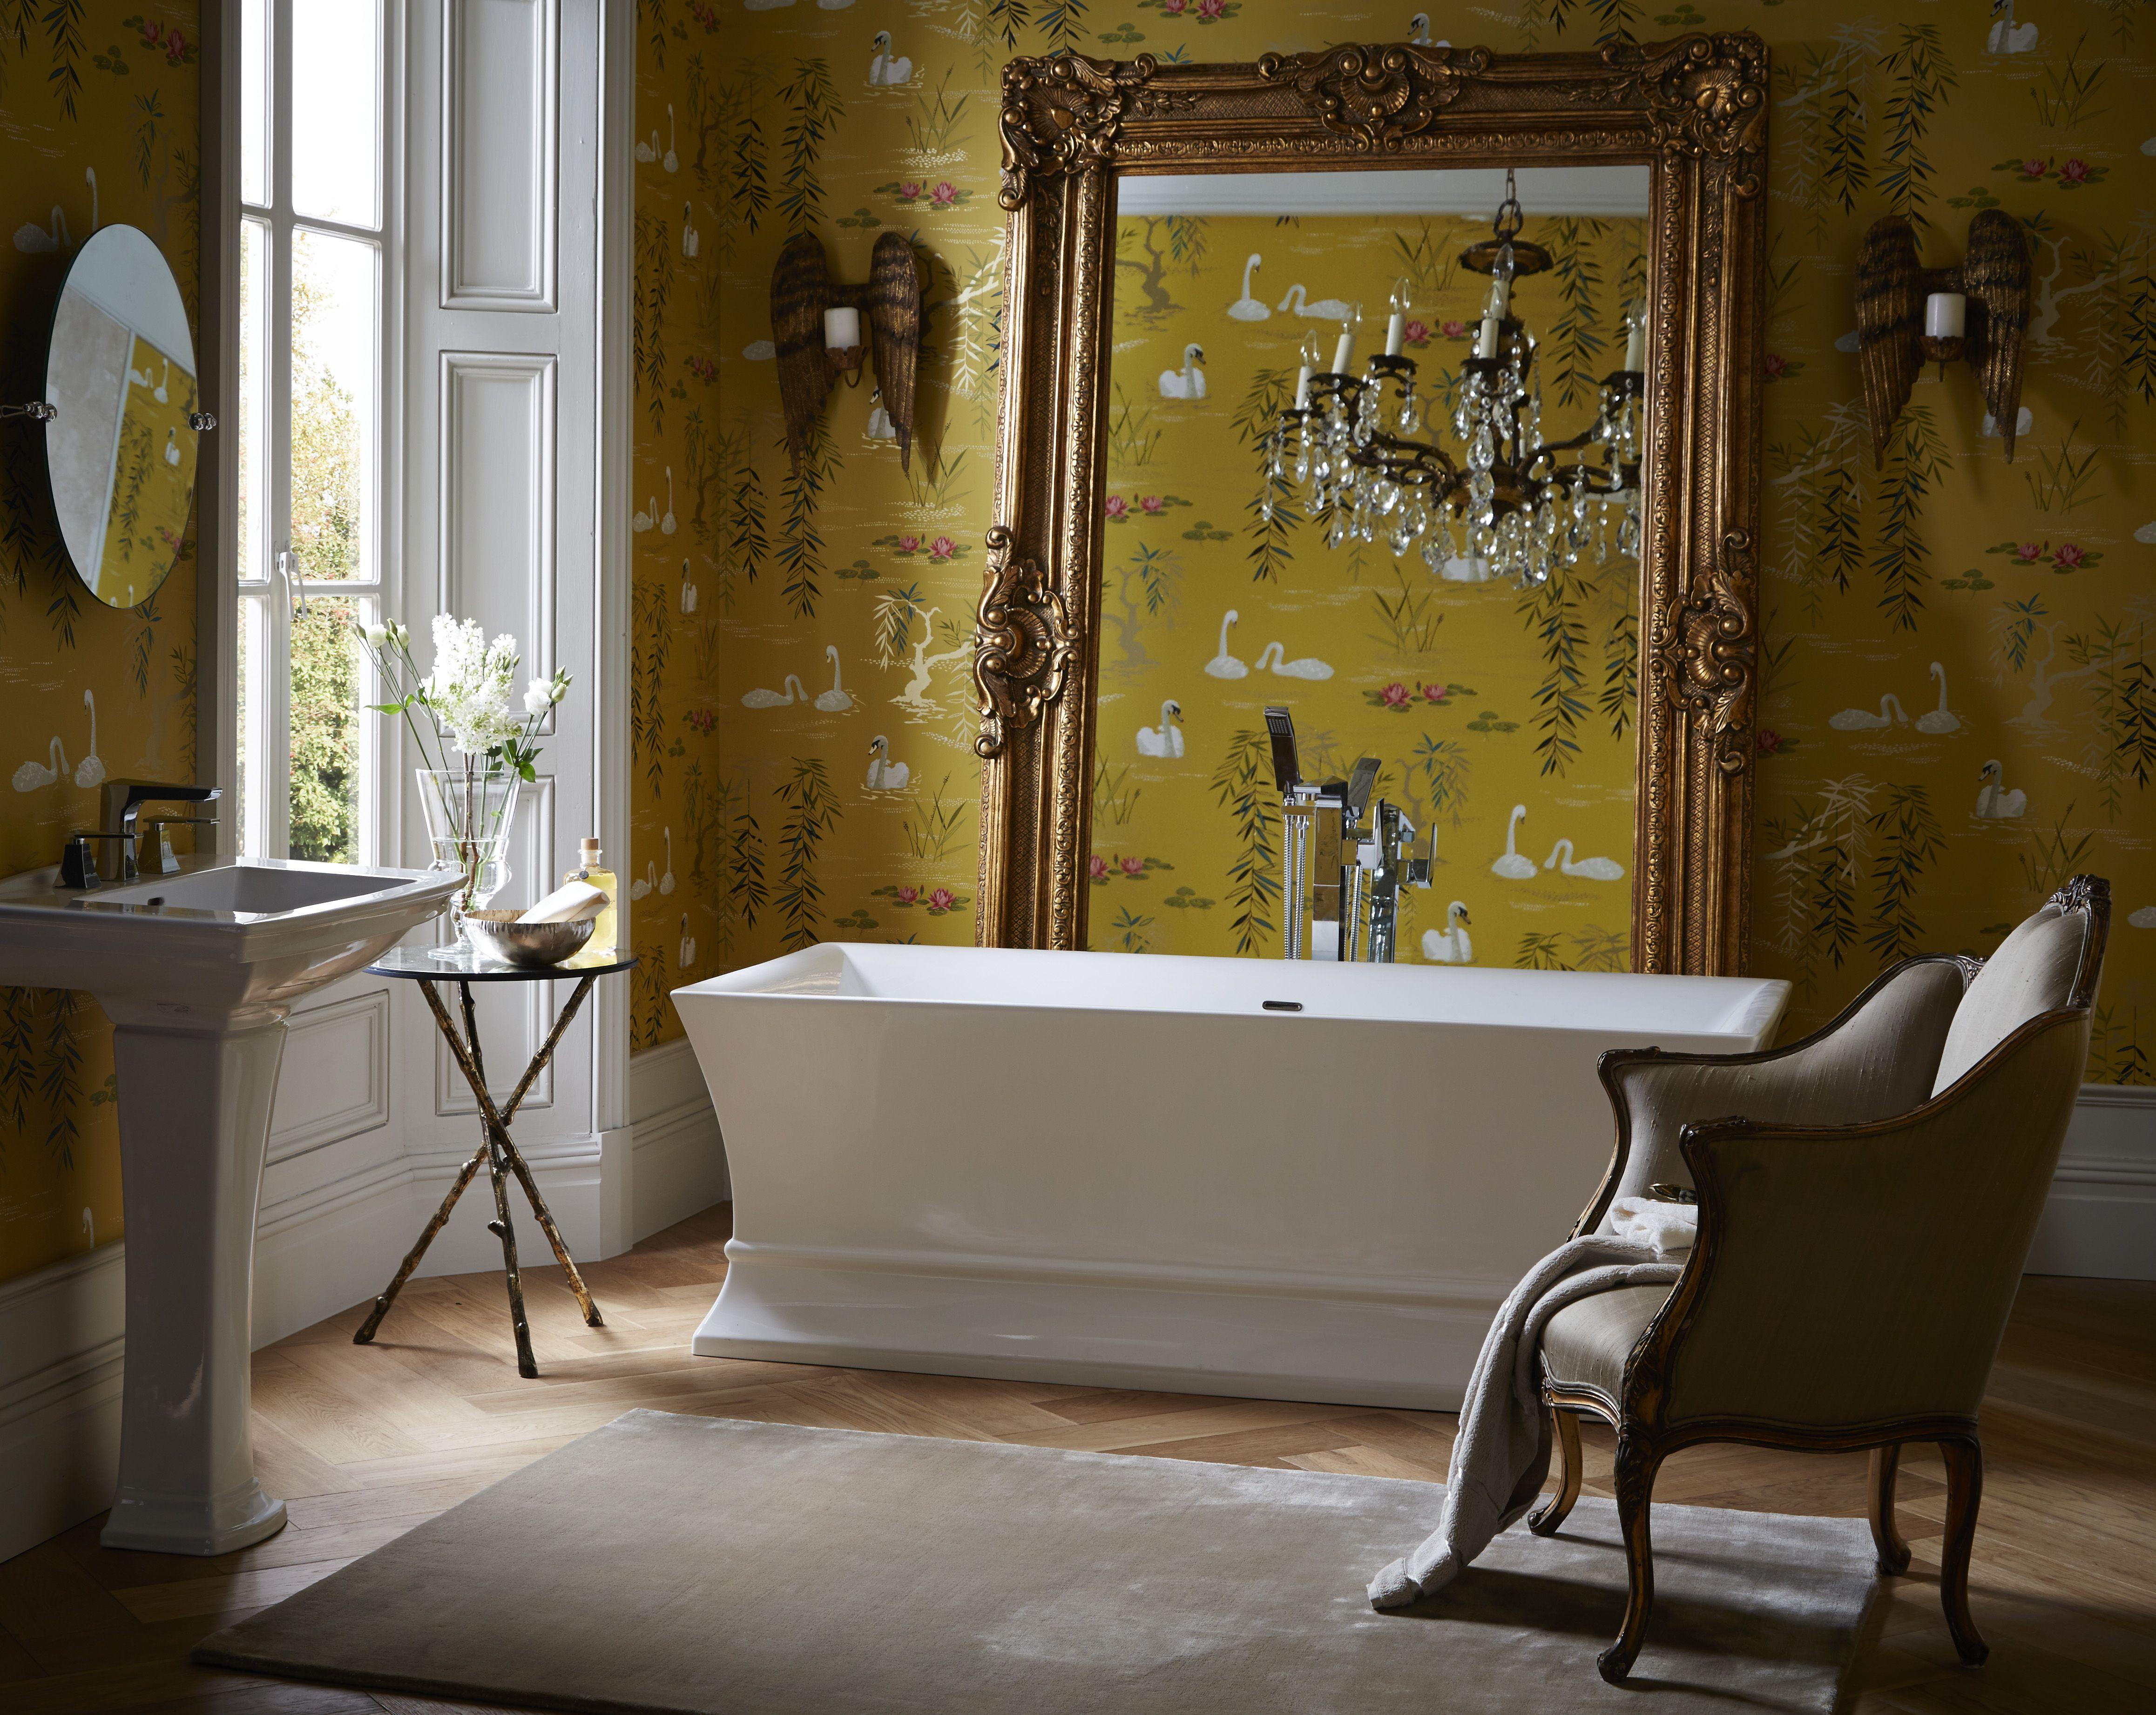 Heritage bathroom furniture - Heritage Bathrooms Grand Chesham Mirror New Penrose Bath Blenheim Sink And Statement Wallpaper